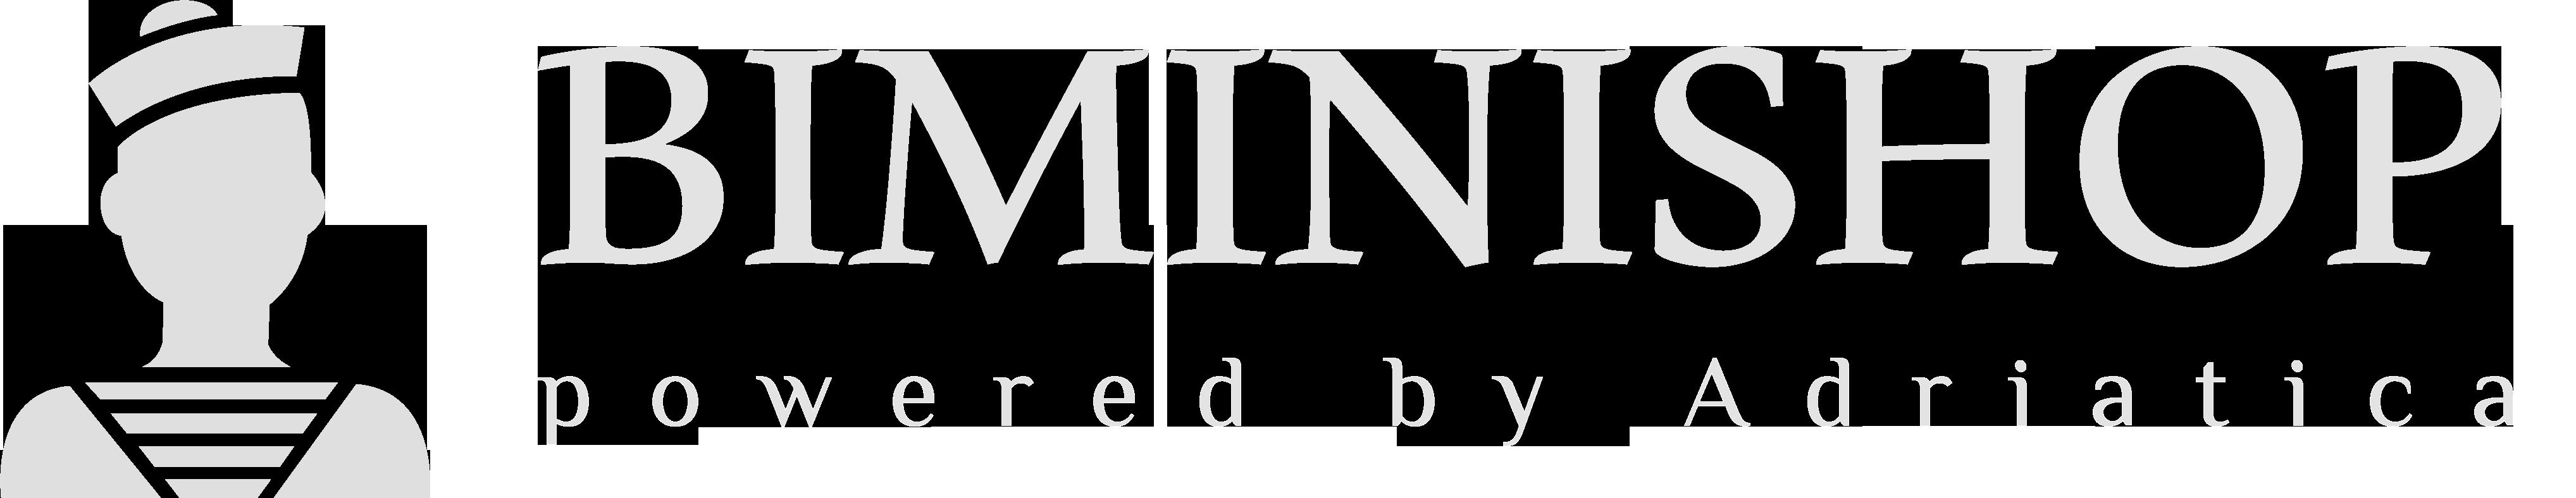 Biminishop - sklep żeglarski